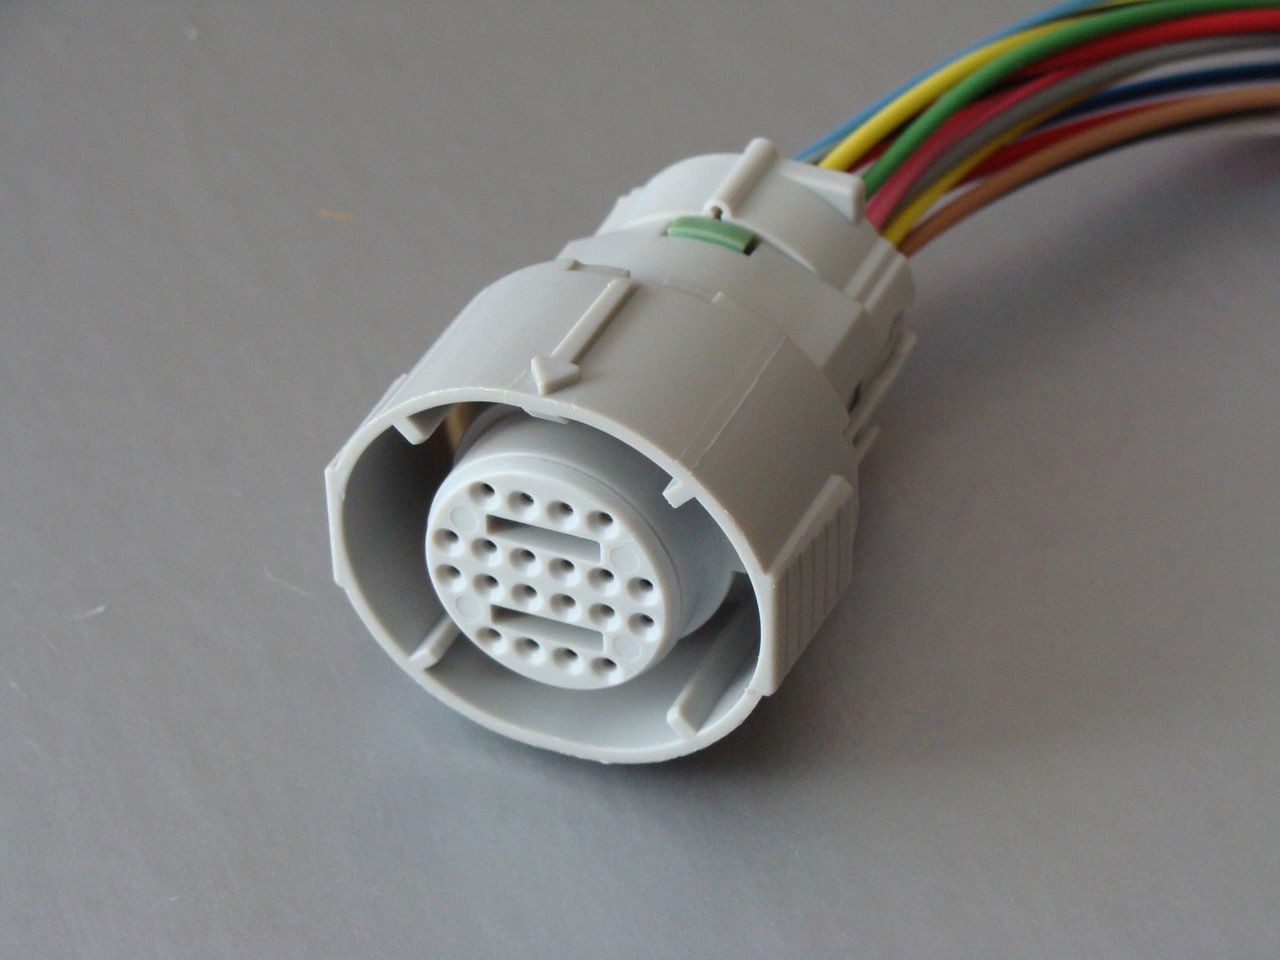 small resolution of 94 02 ls1 lt1 4l60e automatic transmission harness connector hawks lt1 4l60e wiring harness